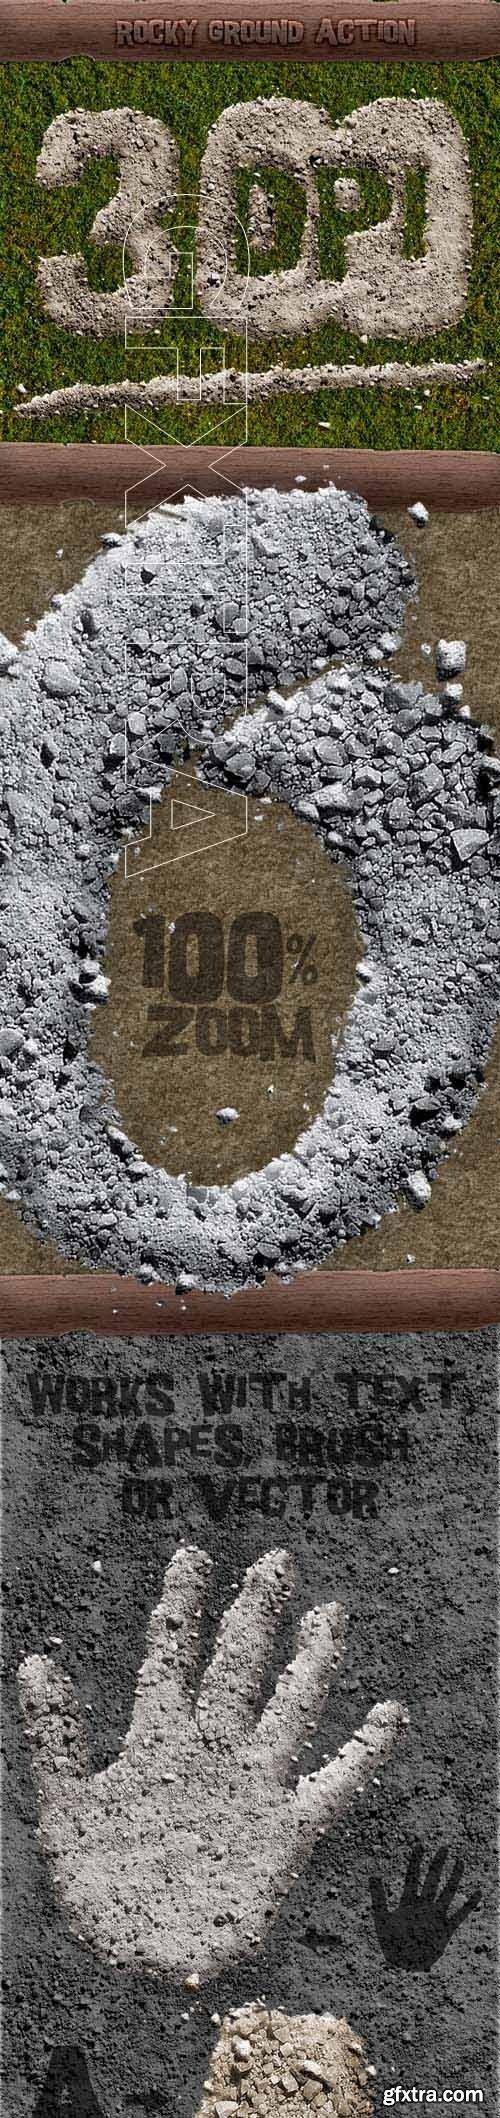 GraphicRiver - Rocky Ground Action - 300 DPI 19812139